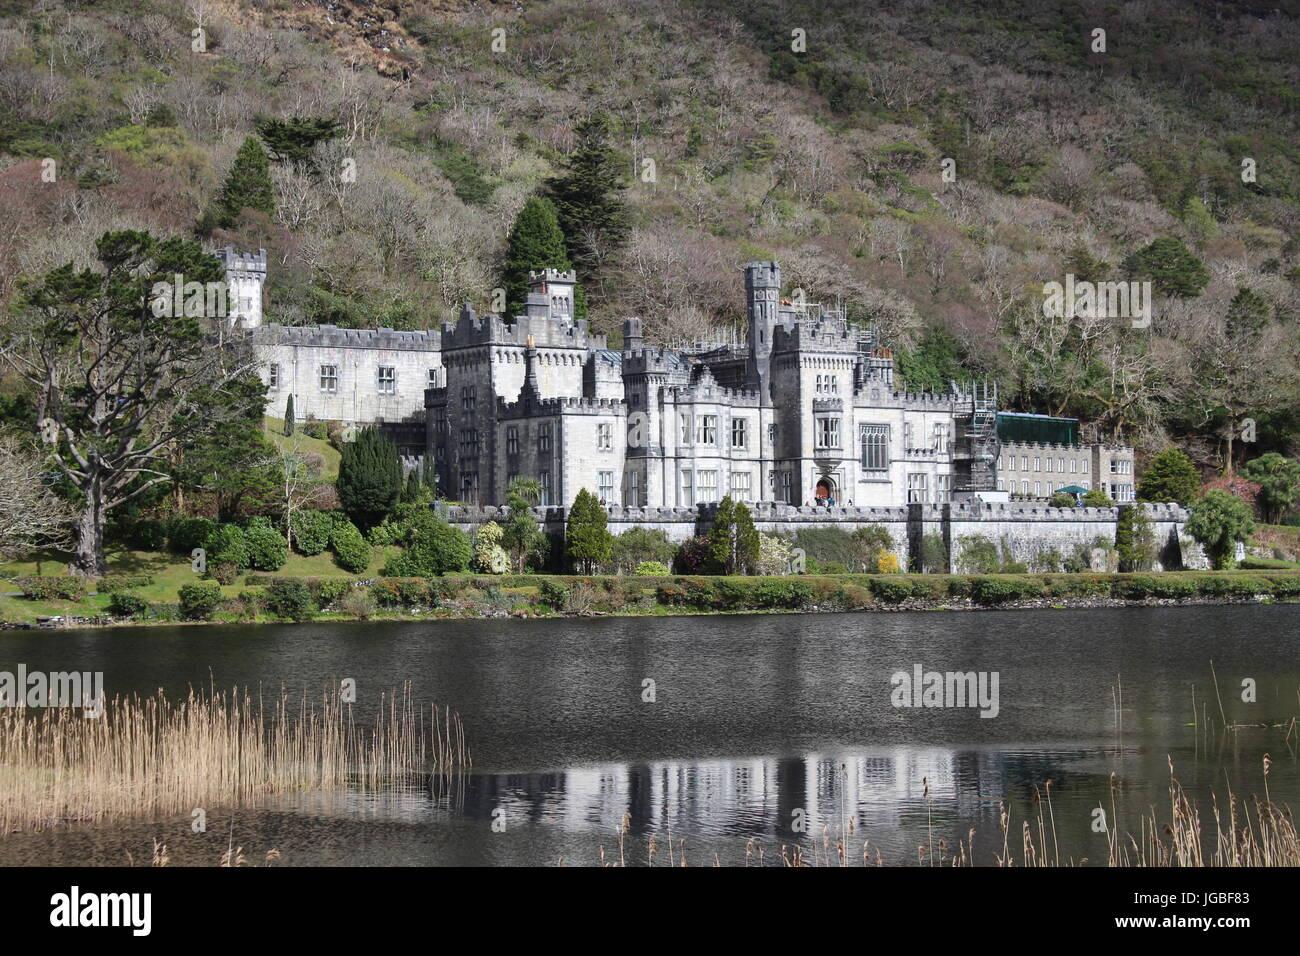 Kylemore Abbey, Connemara region, Ireland, Europe Stock Photo